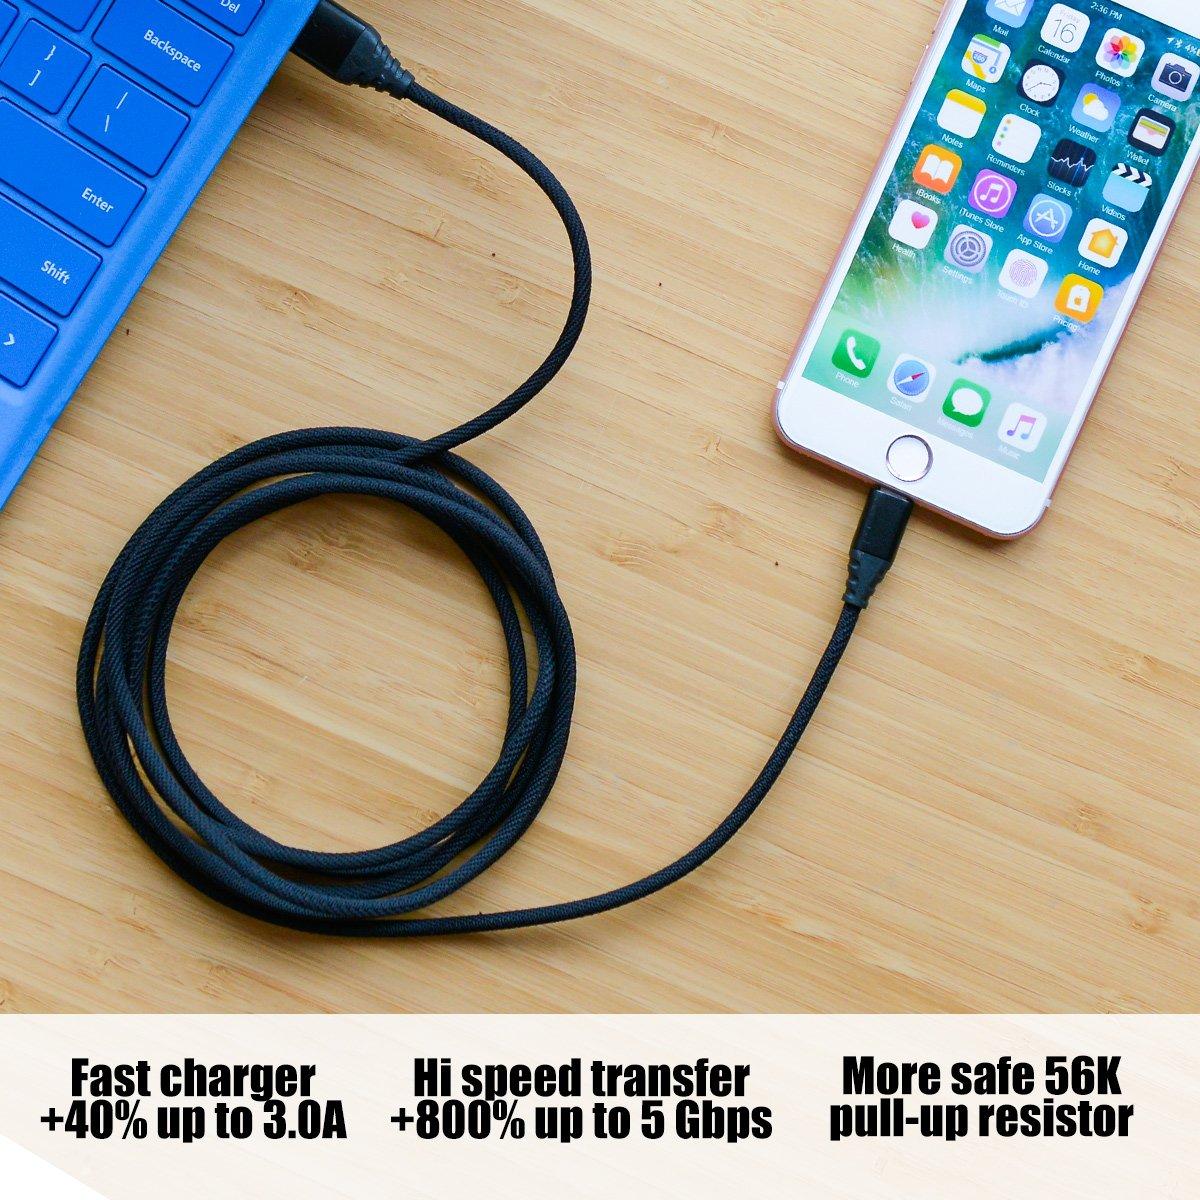 amazon com kuool charger for phone 3 pack 10 ft 6 ft 3 ft light rh amazon com